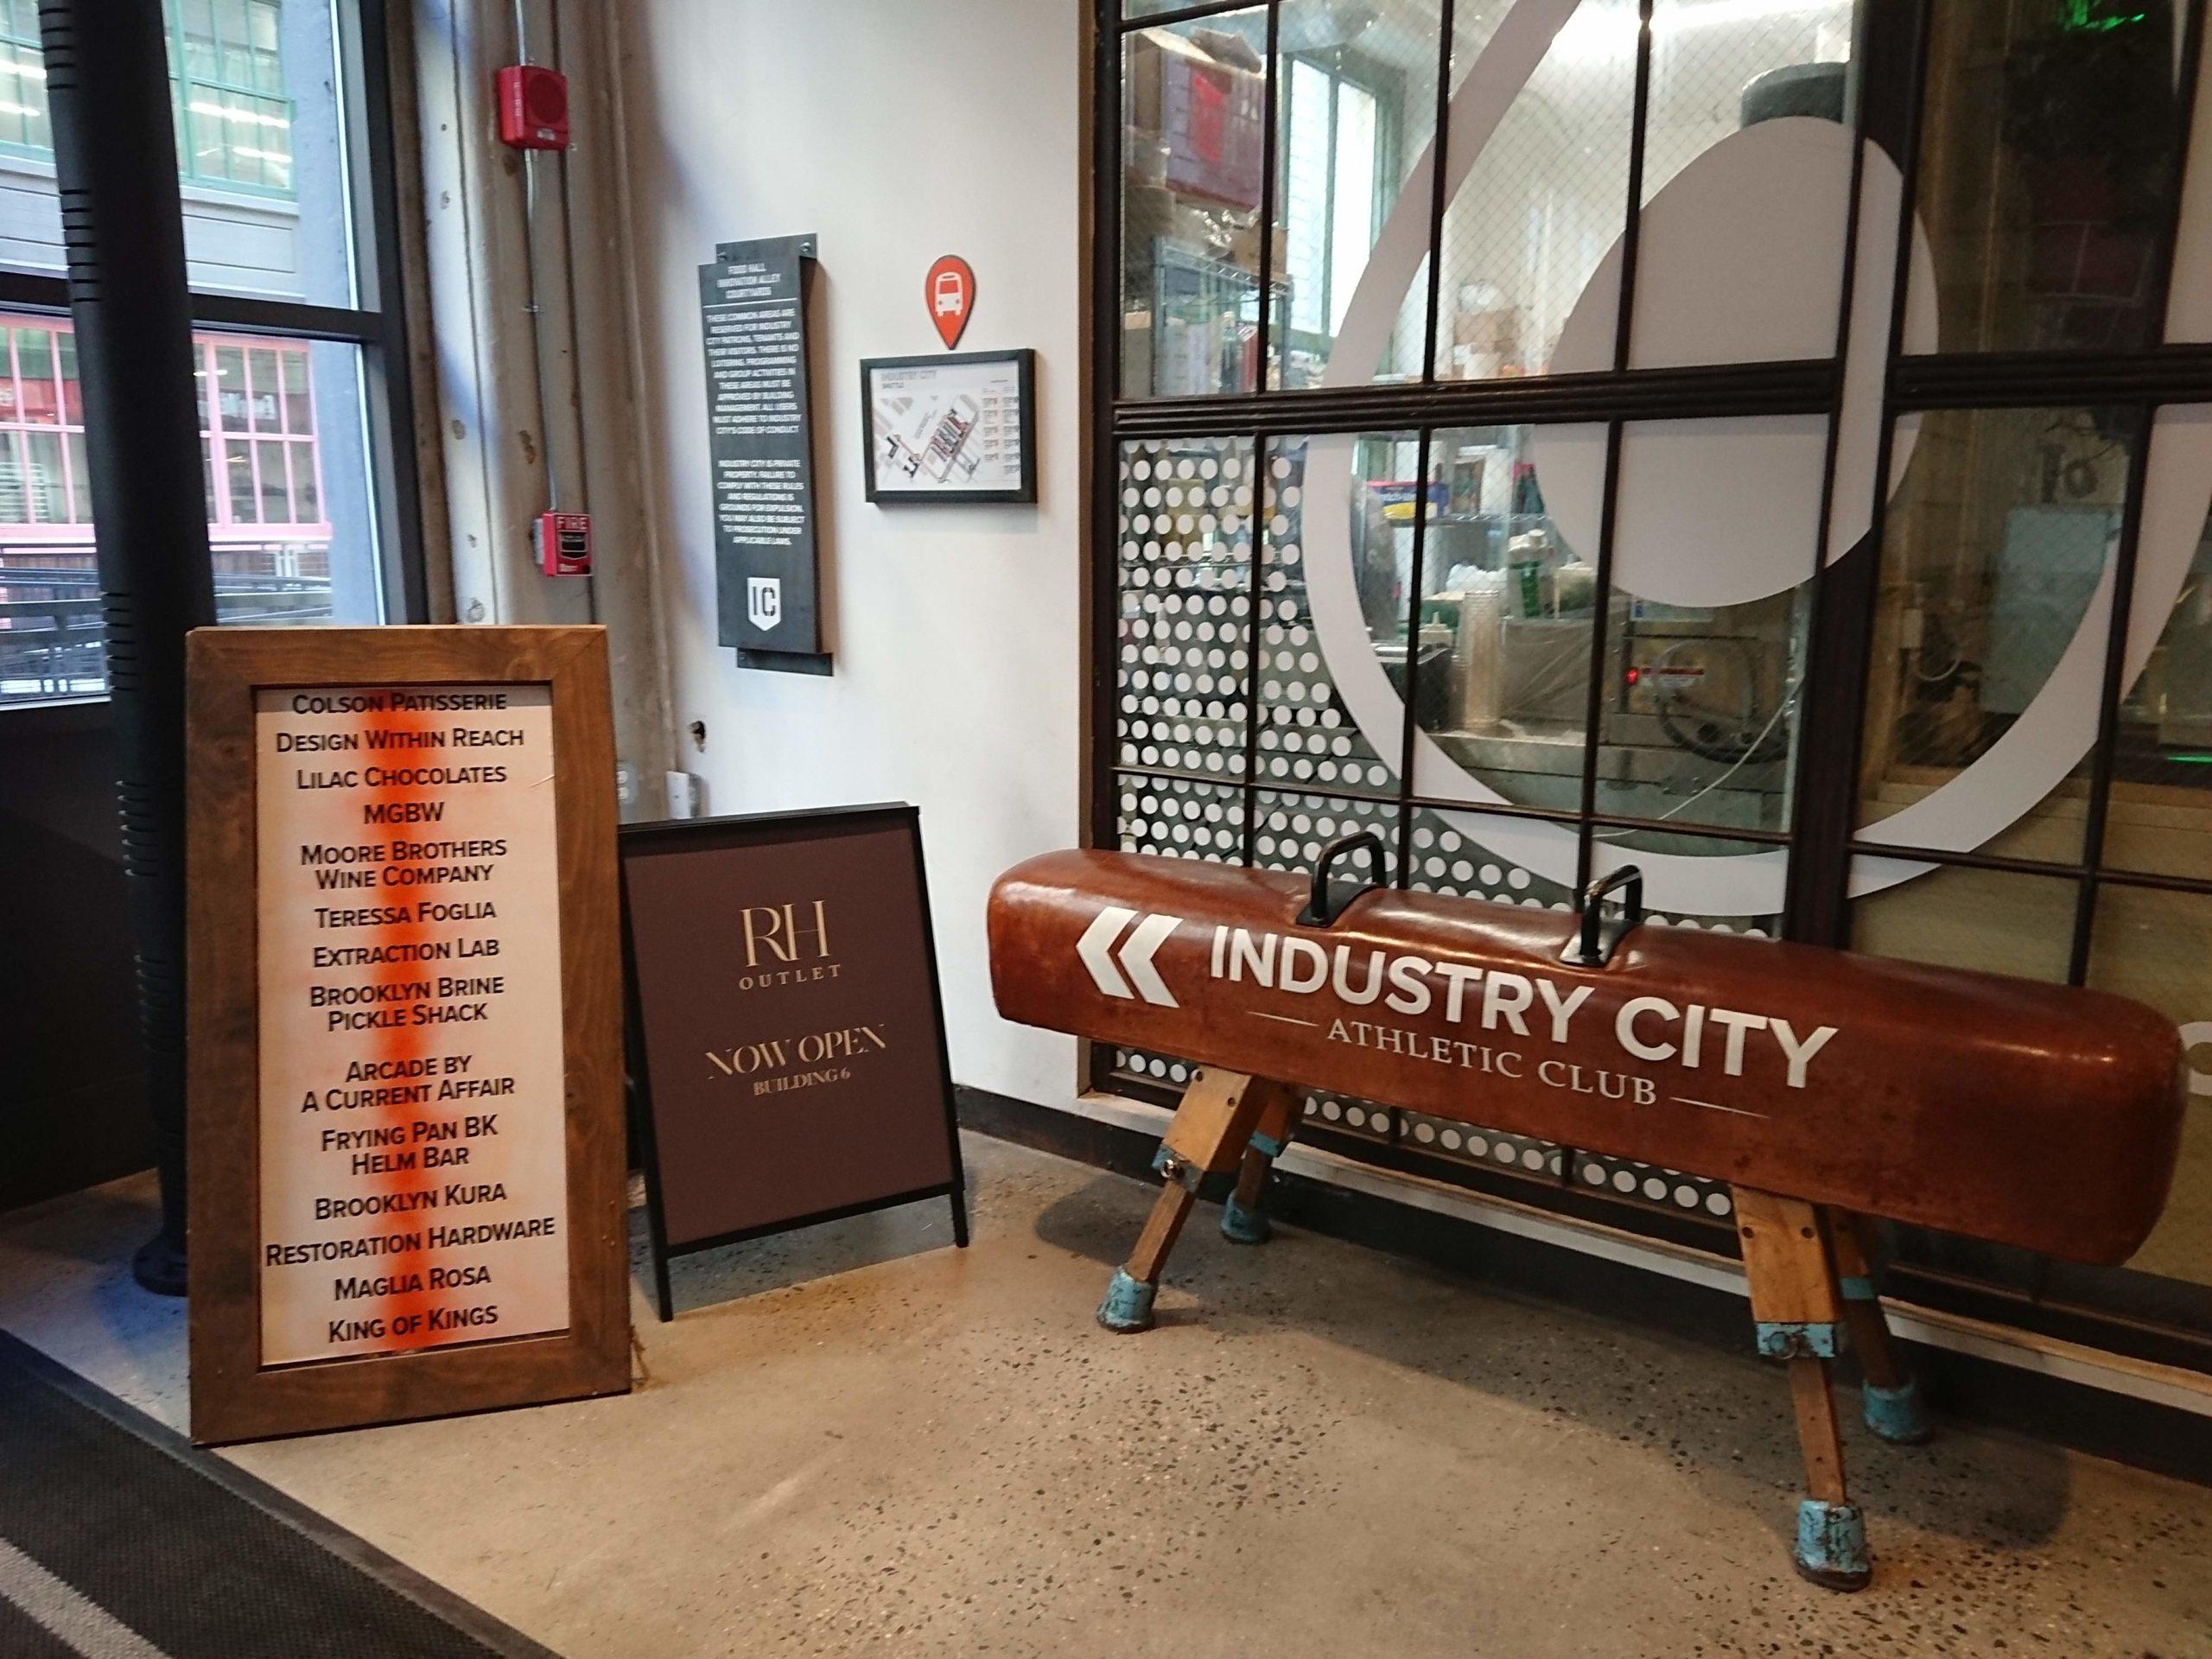 NYC_industrycity